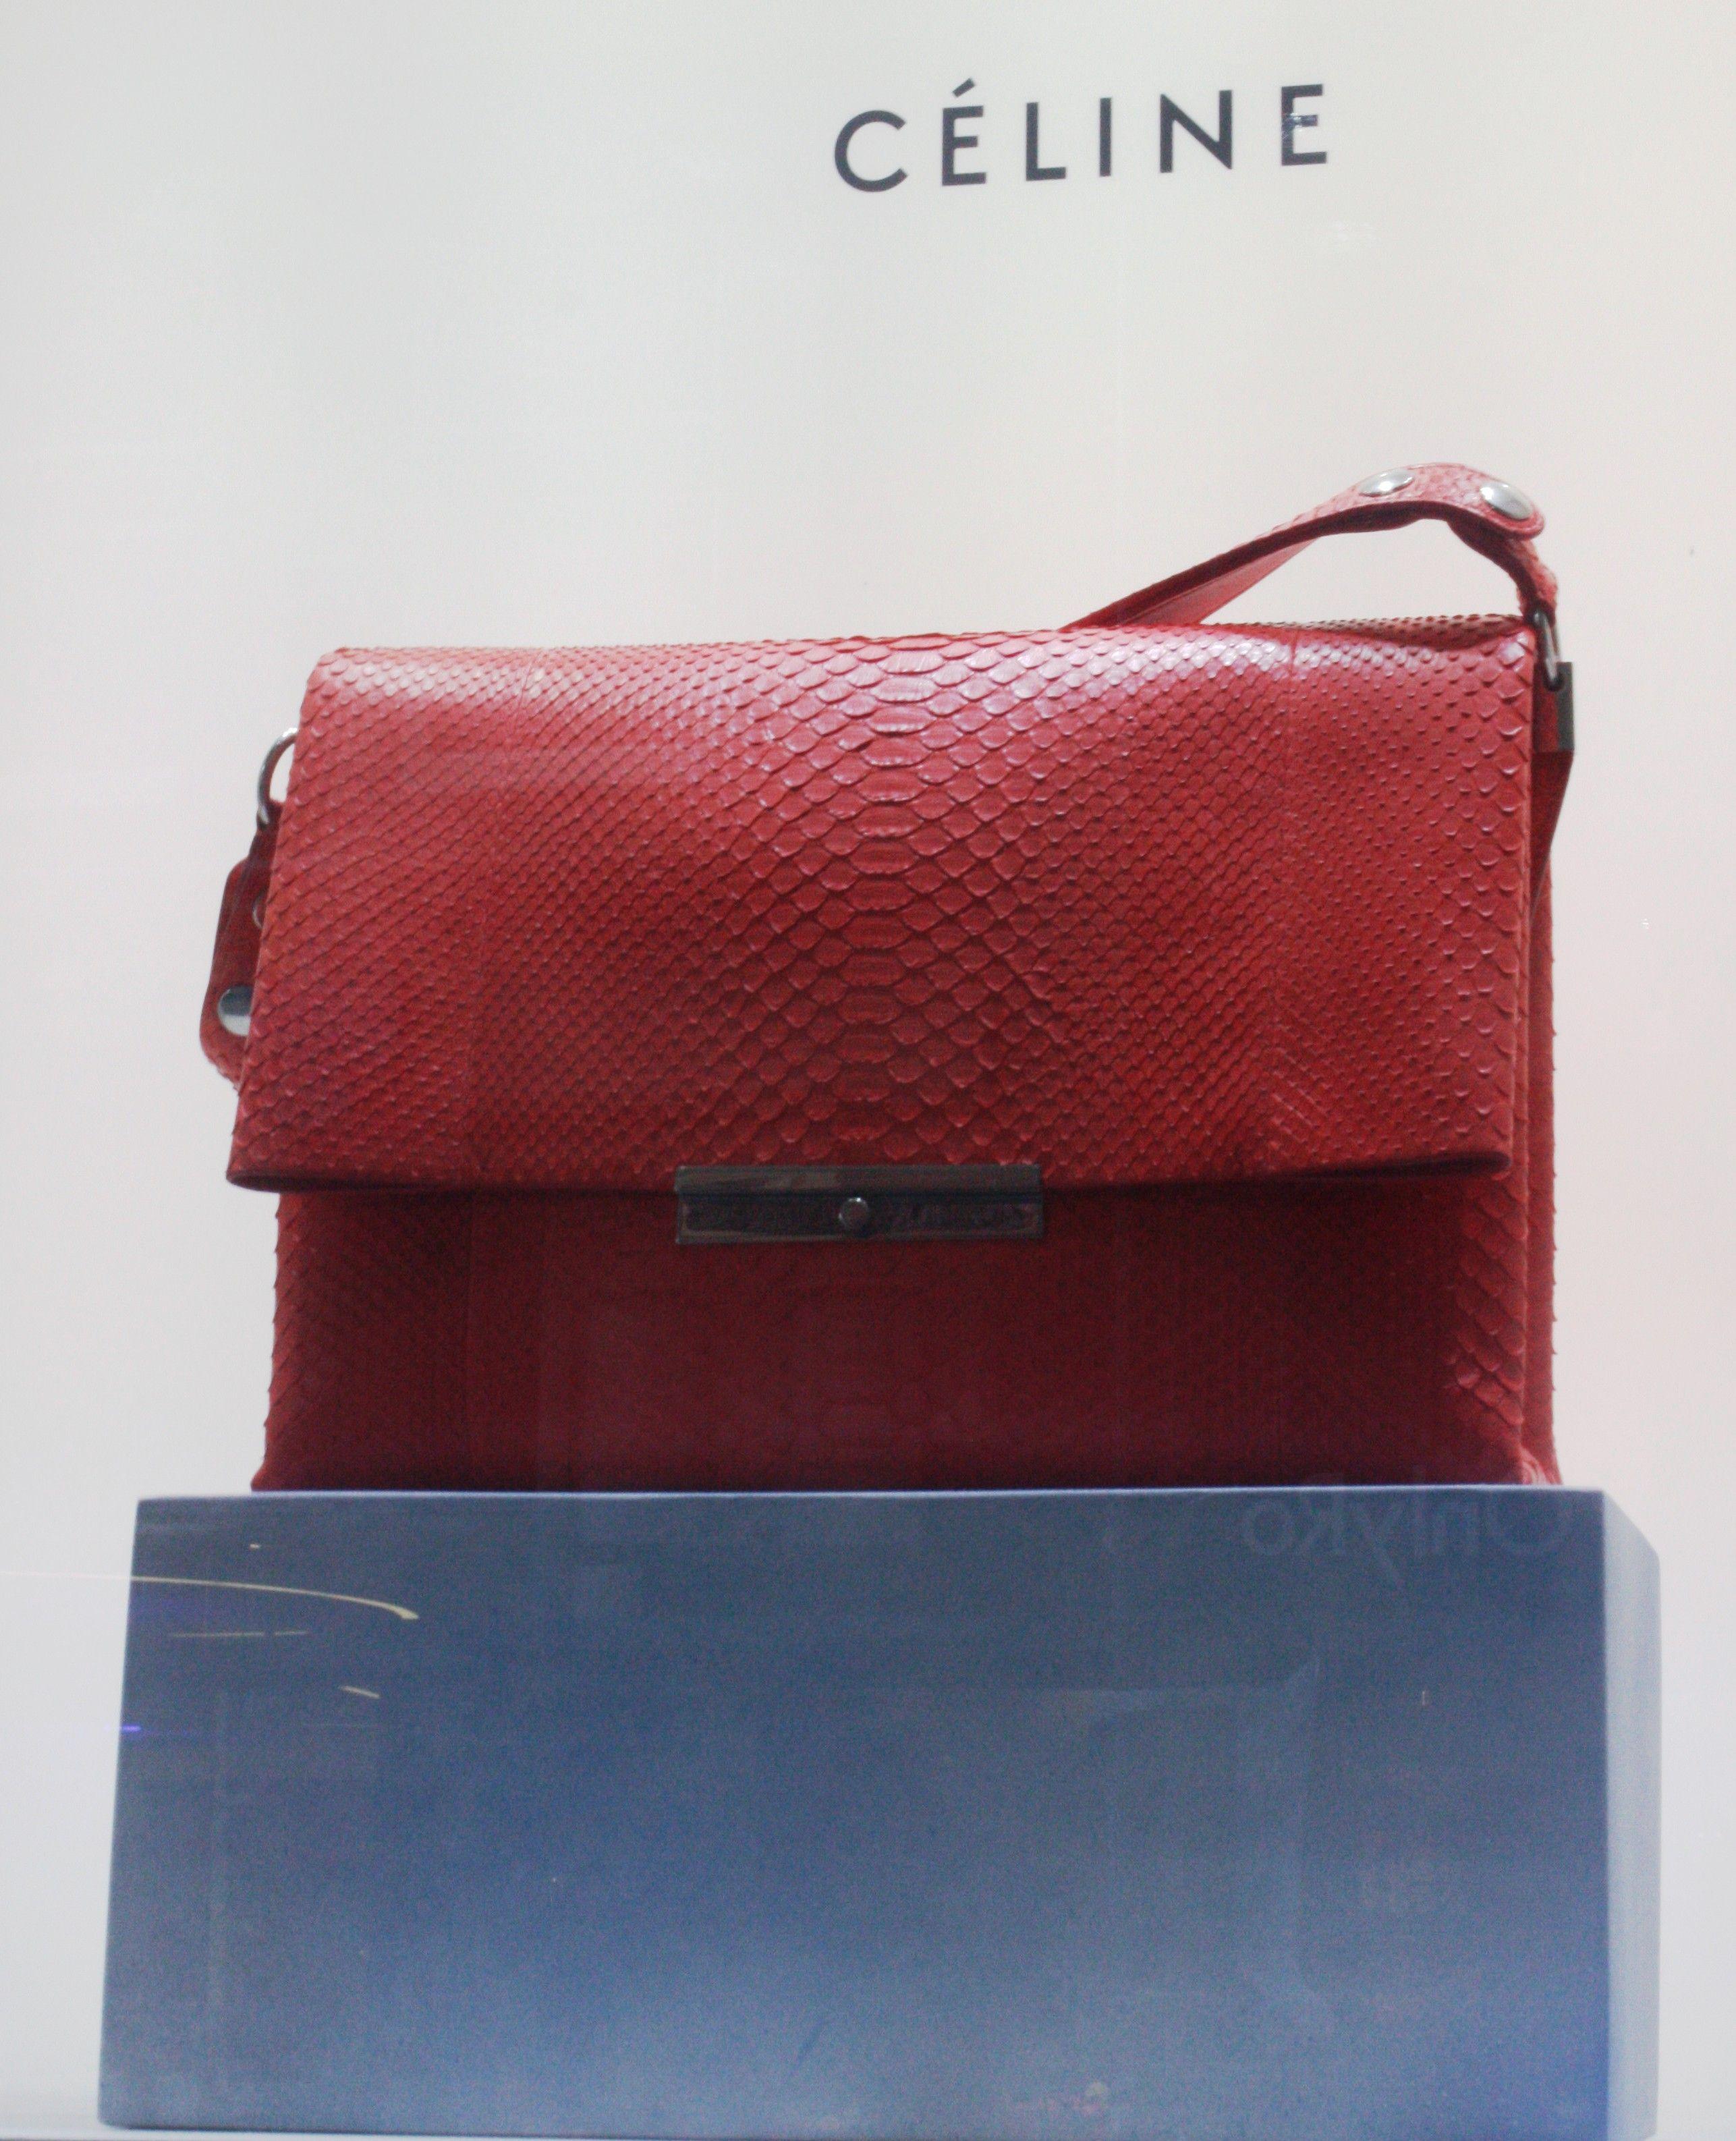 Celine Bag Harrods